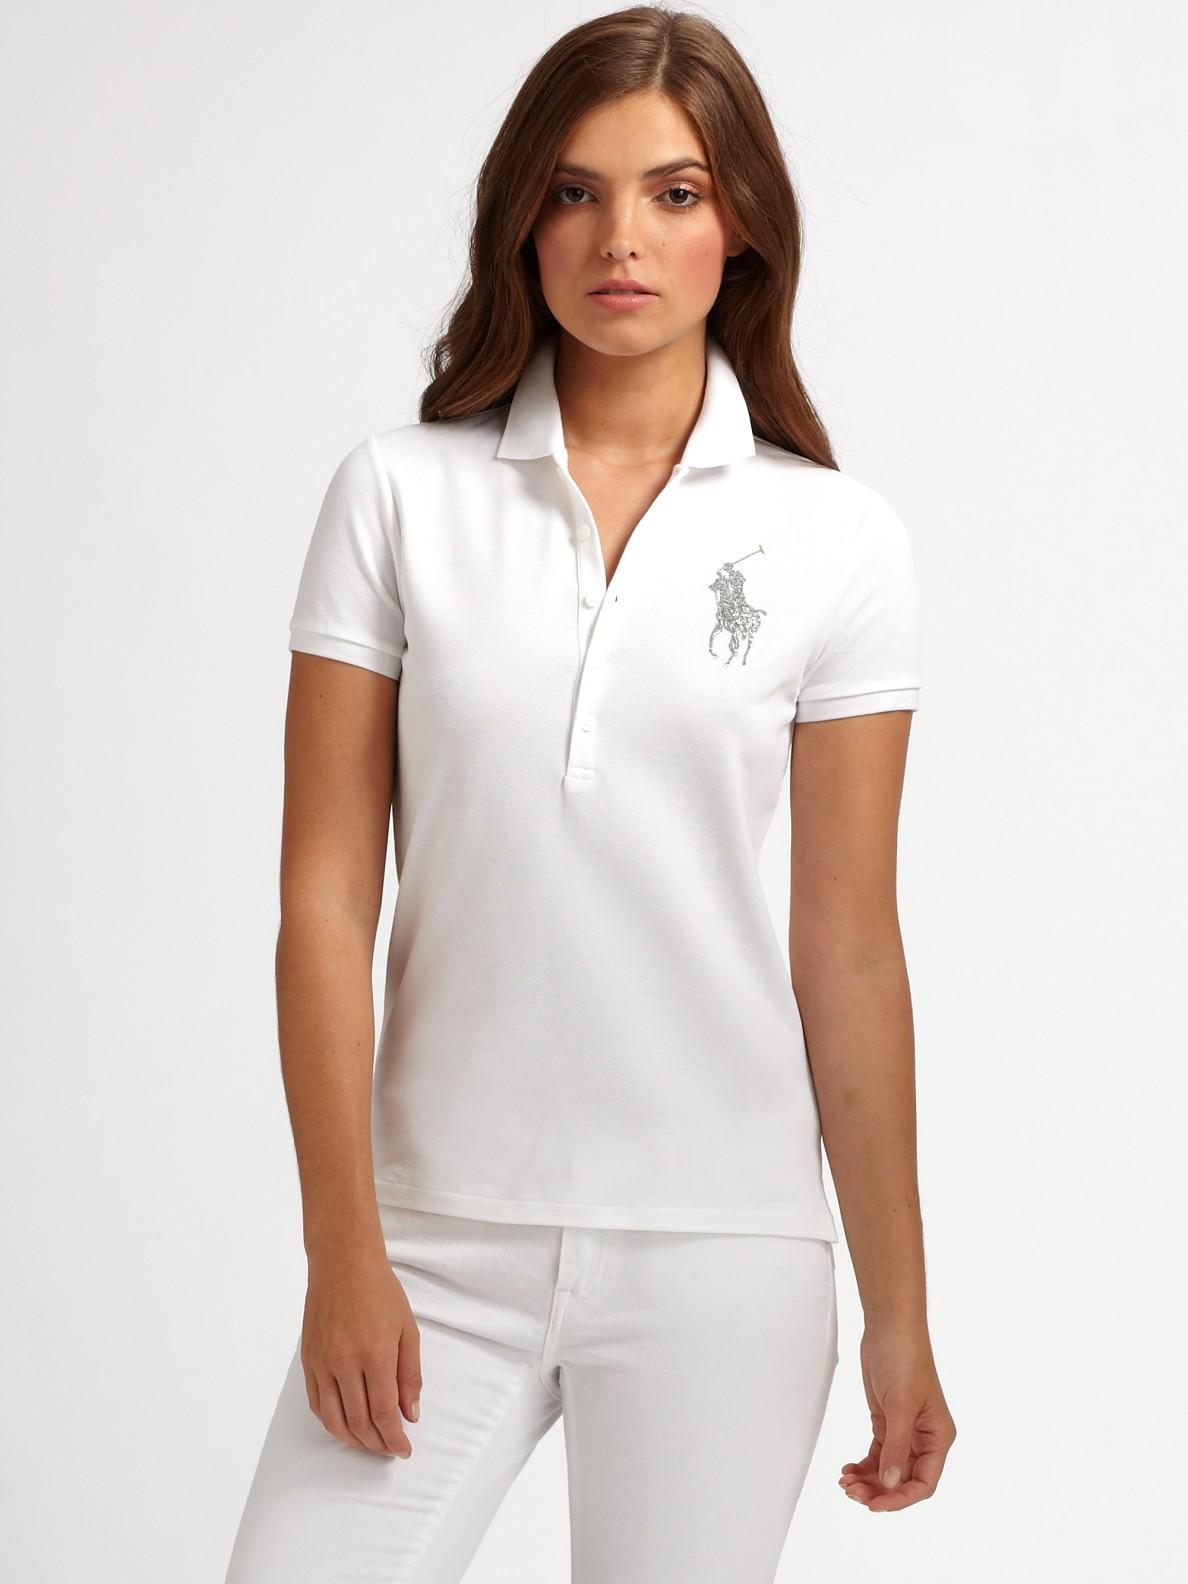 cc07f3bd30 Lyst - Ralph Lauren Blue Label Swarovski Crystal Stretch Polo in White